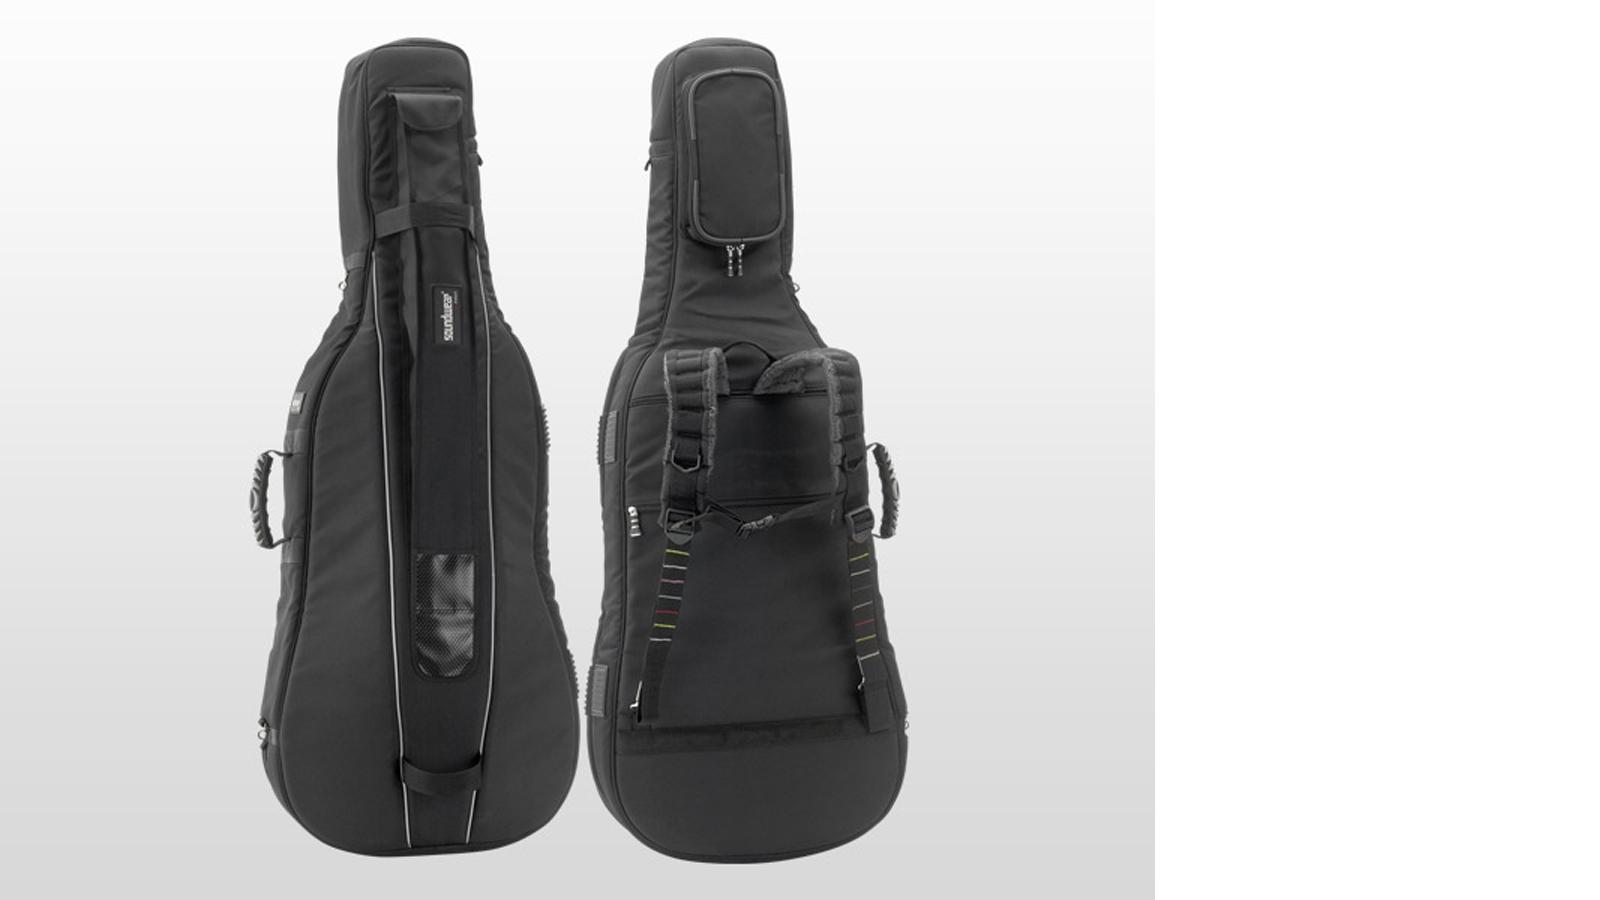 Soundwear Cello Tasche Protector schwarz 4/4